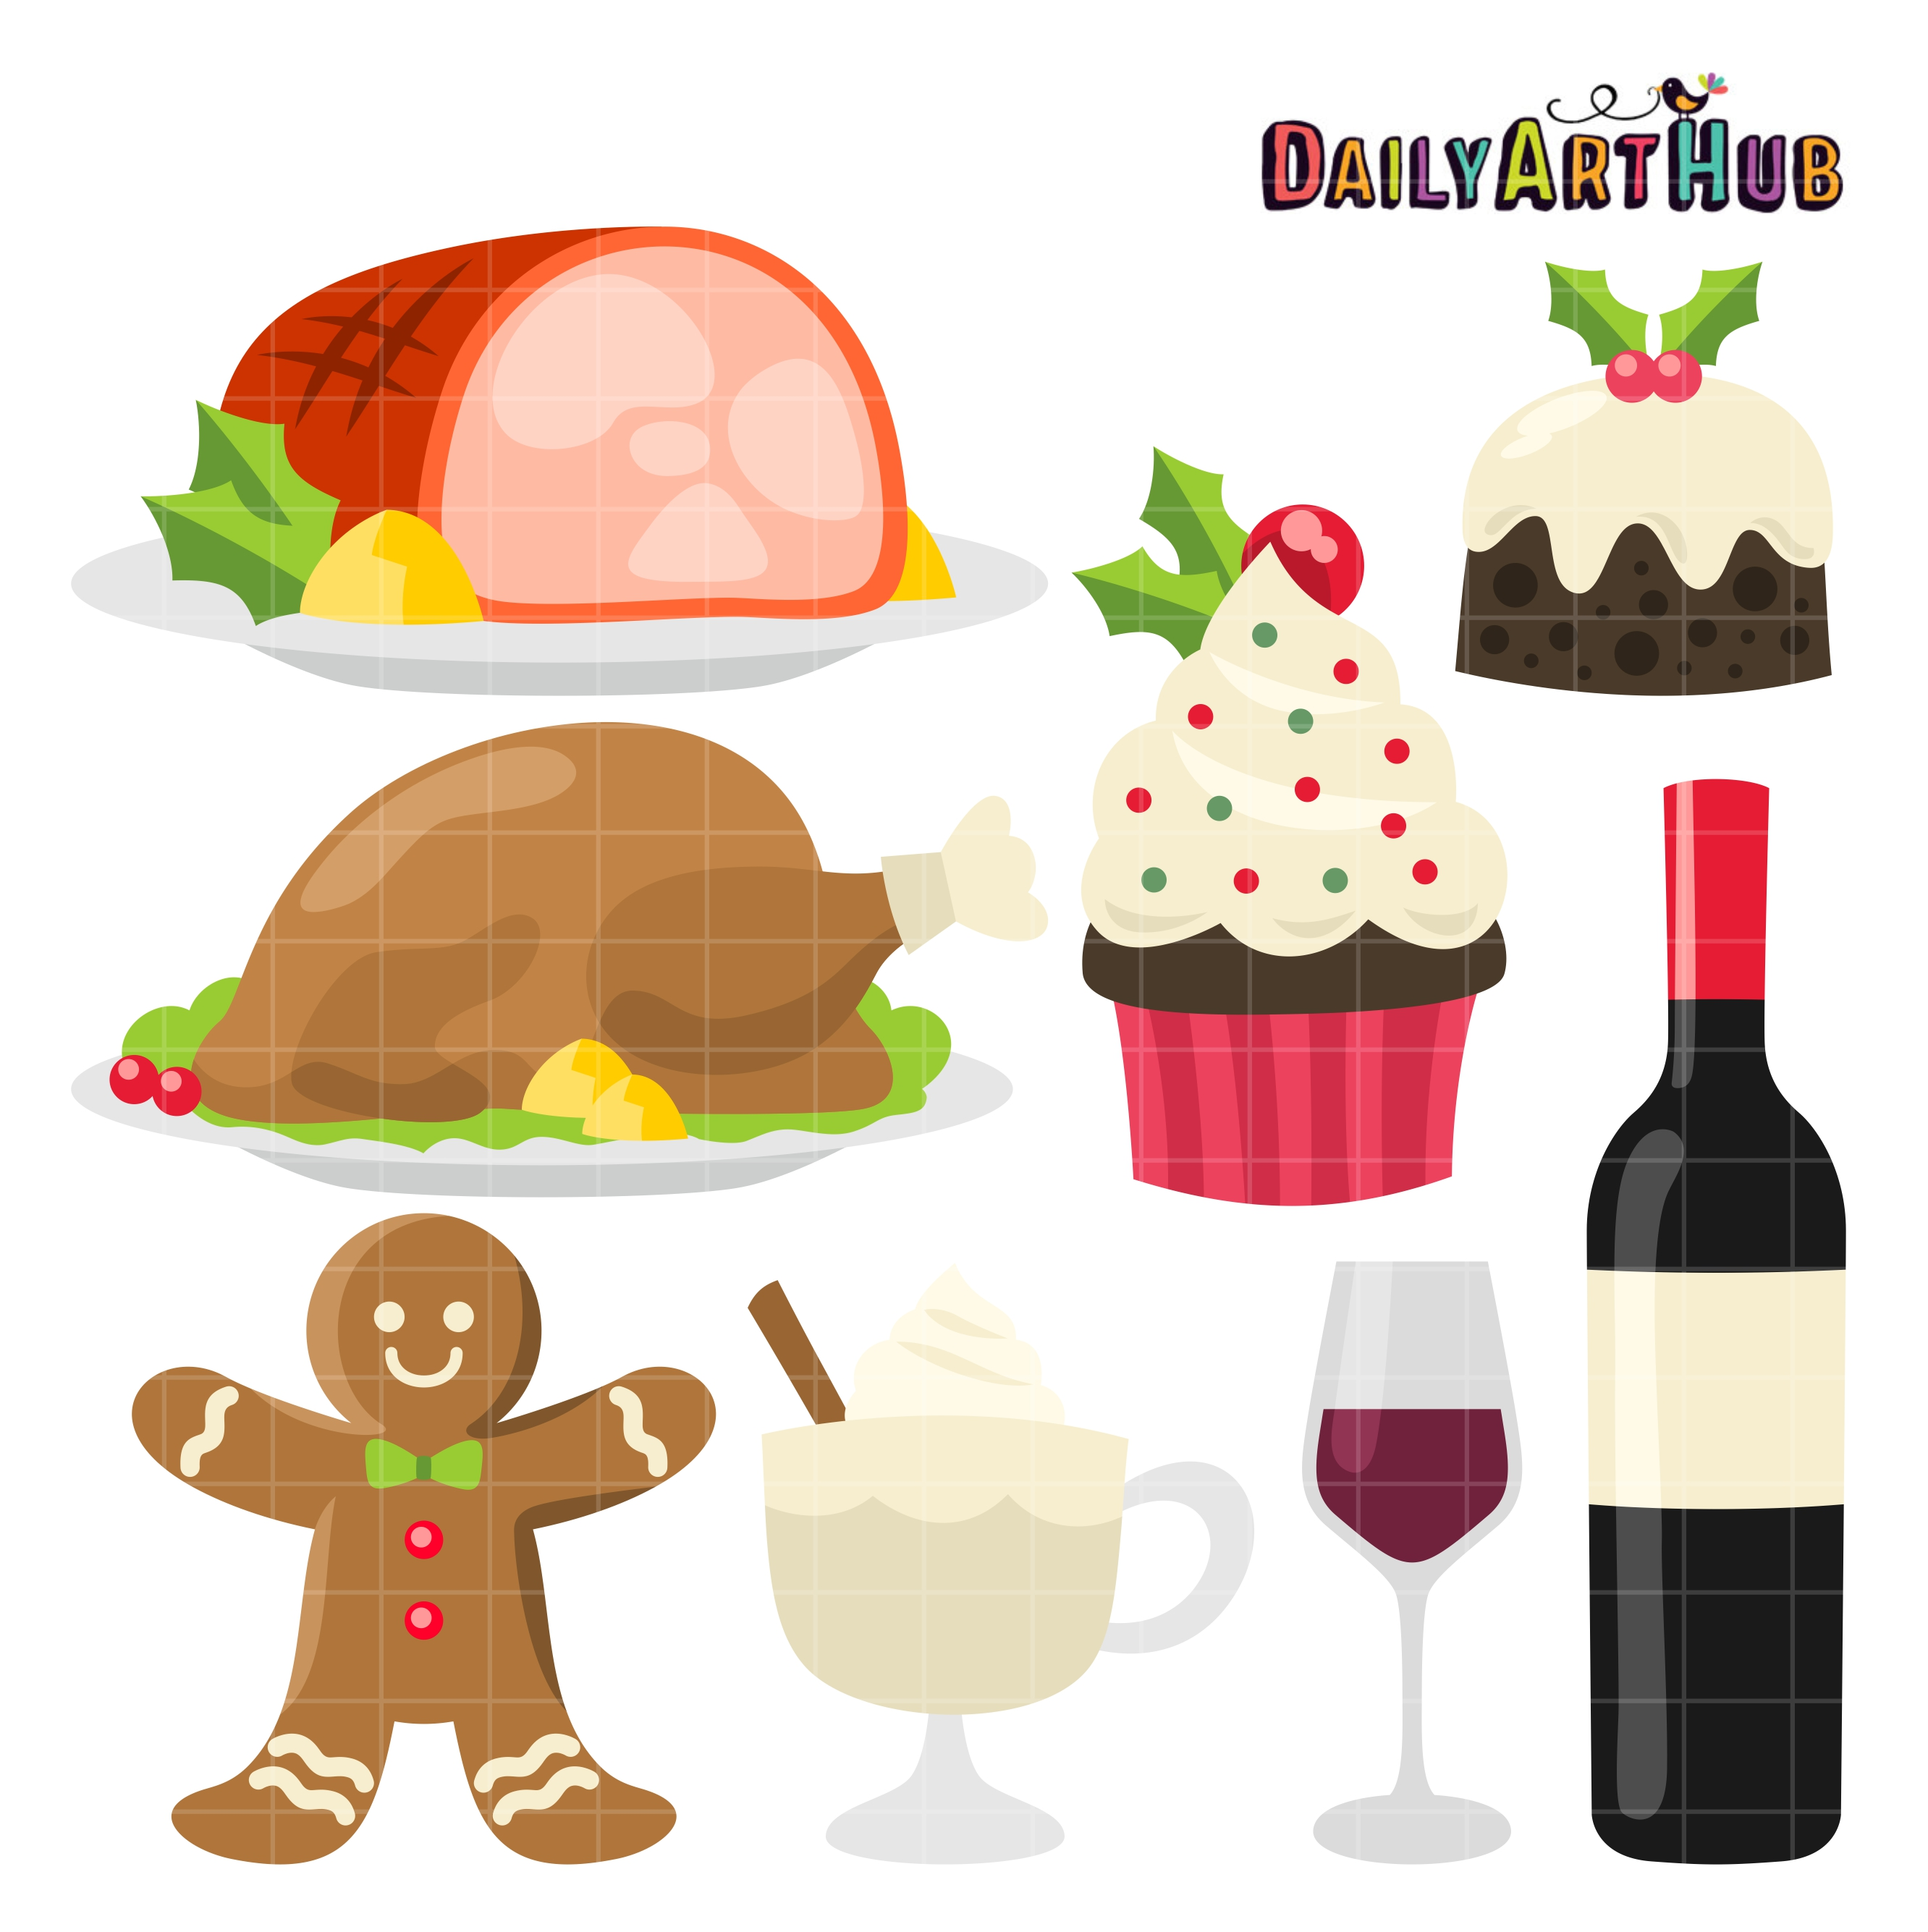 Christmas Foods Clip Art Set Daily Art Hub Free Clip Art Everyday